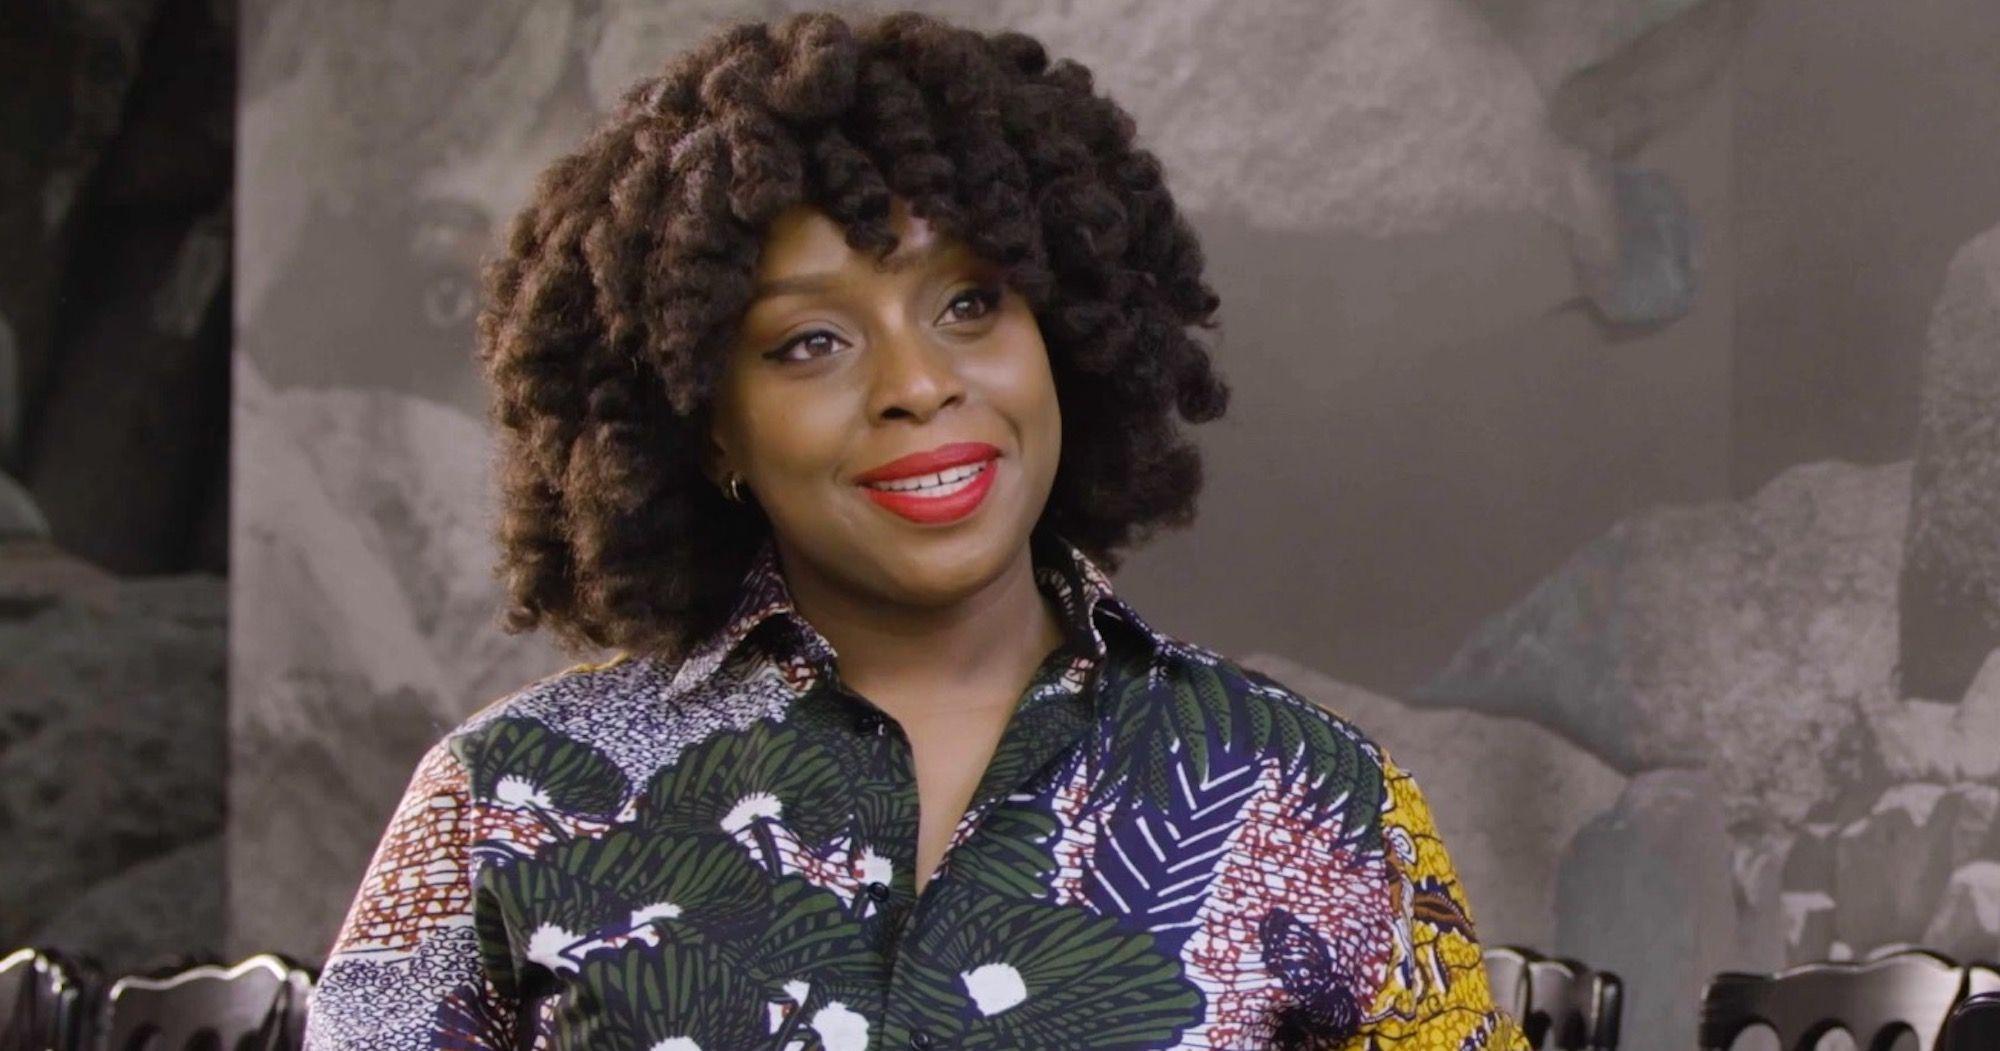 Chimamanda Ngozi Adichie On Why She Agreed To Work With Maria Grazia Chiuri On Her Feminist Statement For Dior